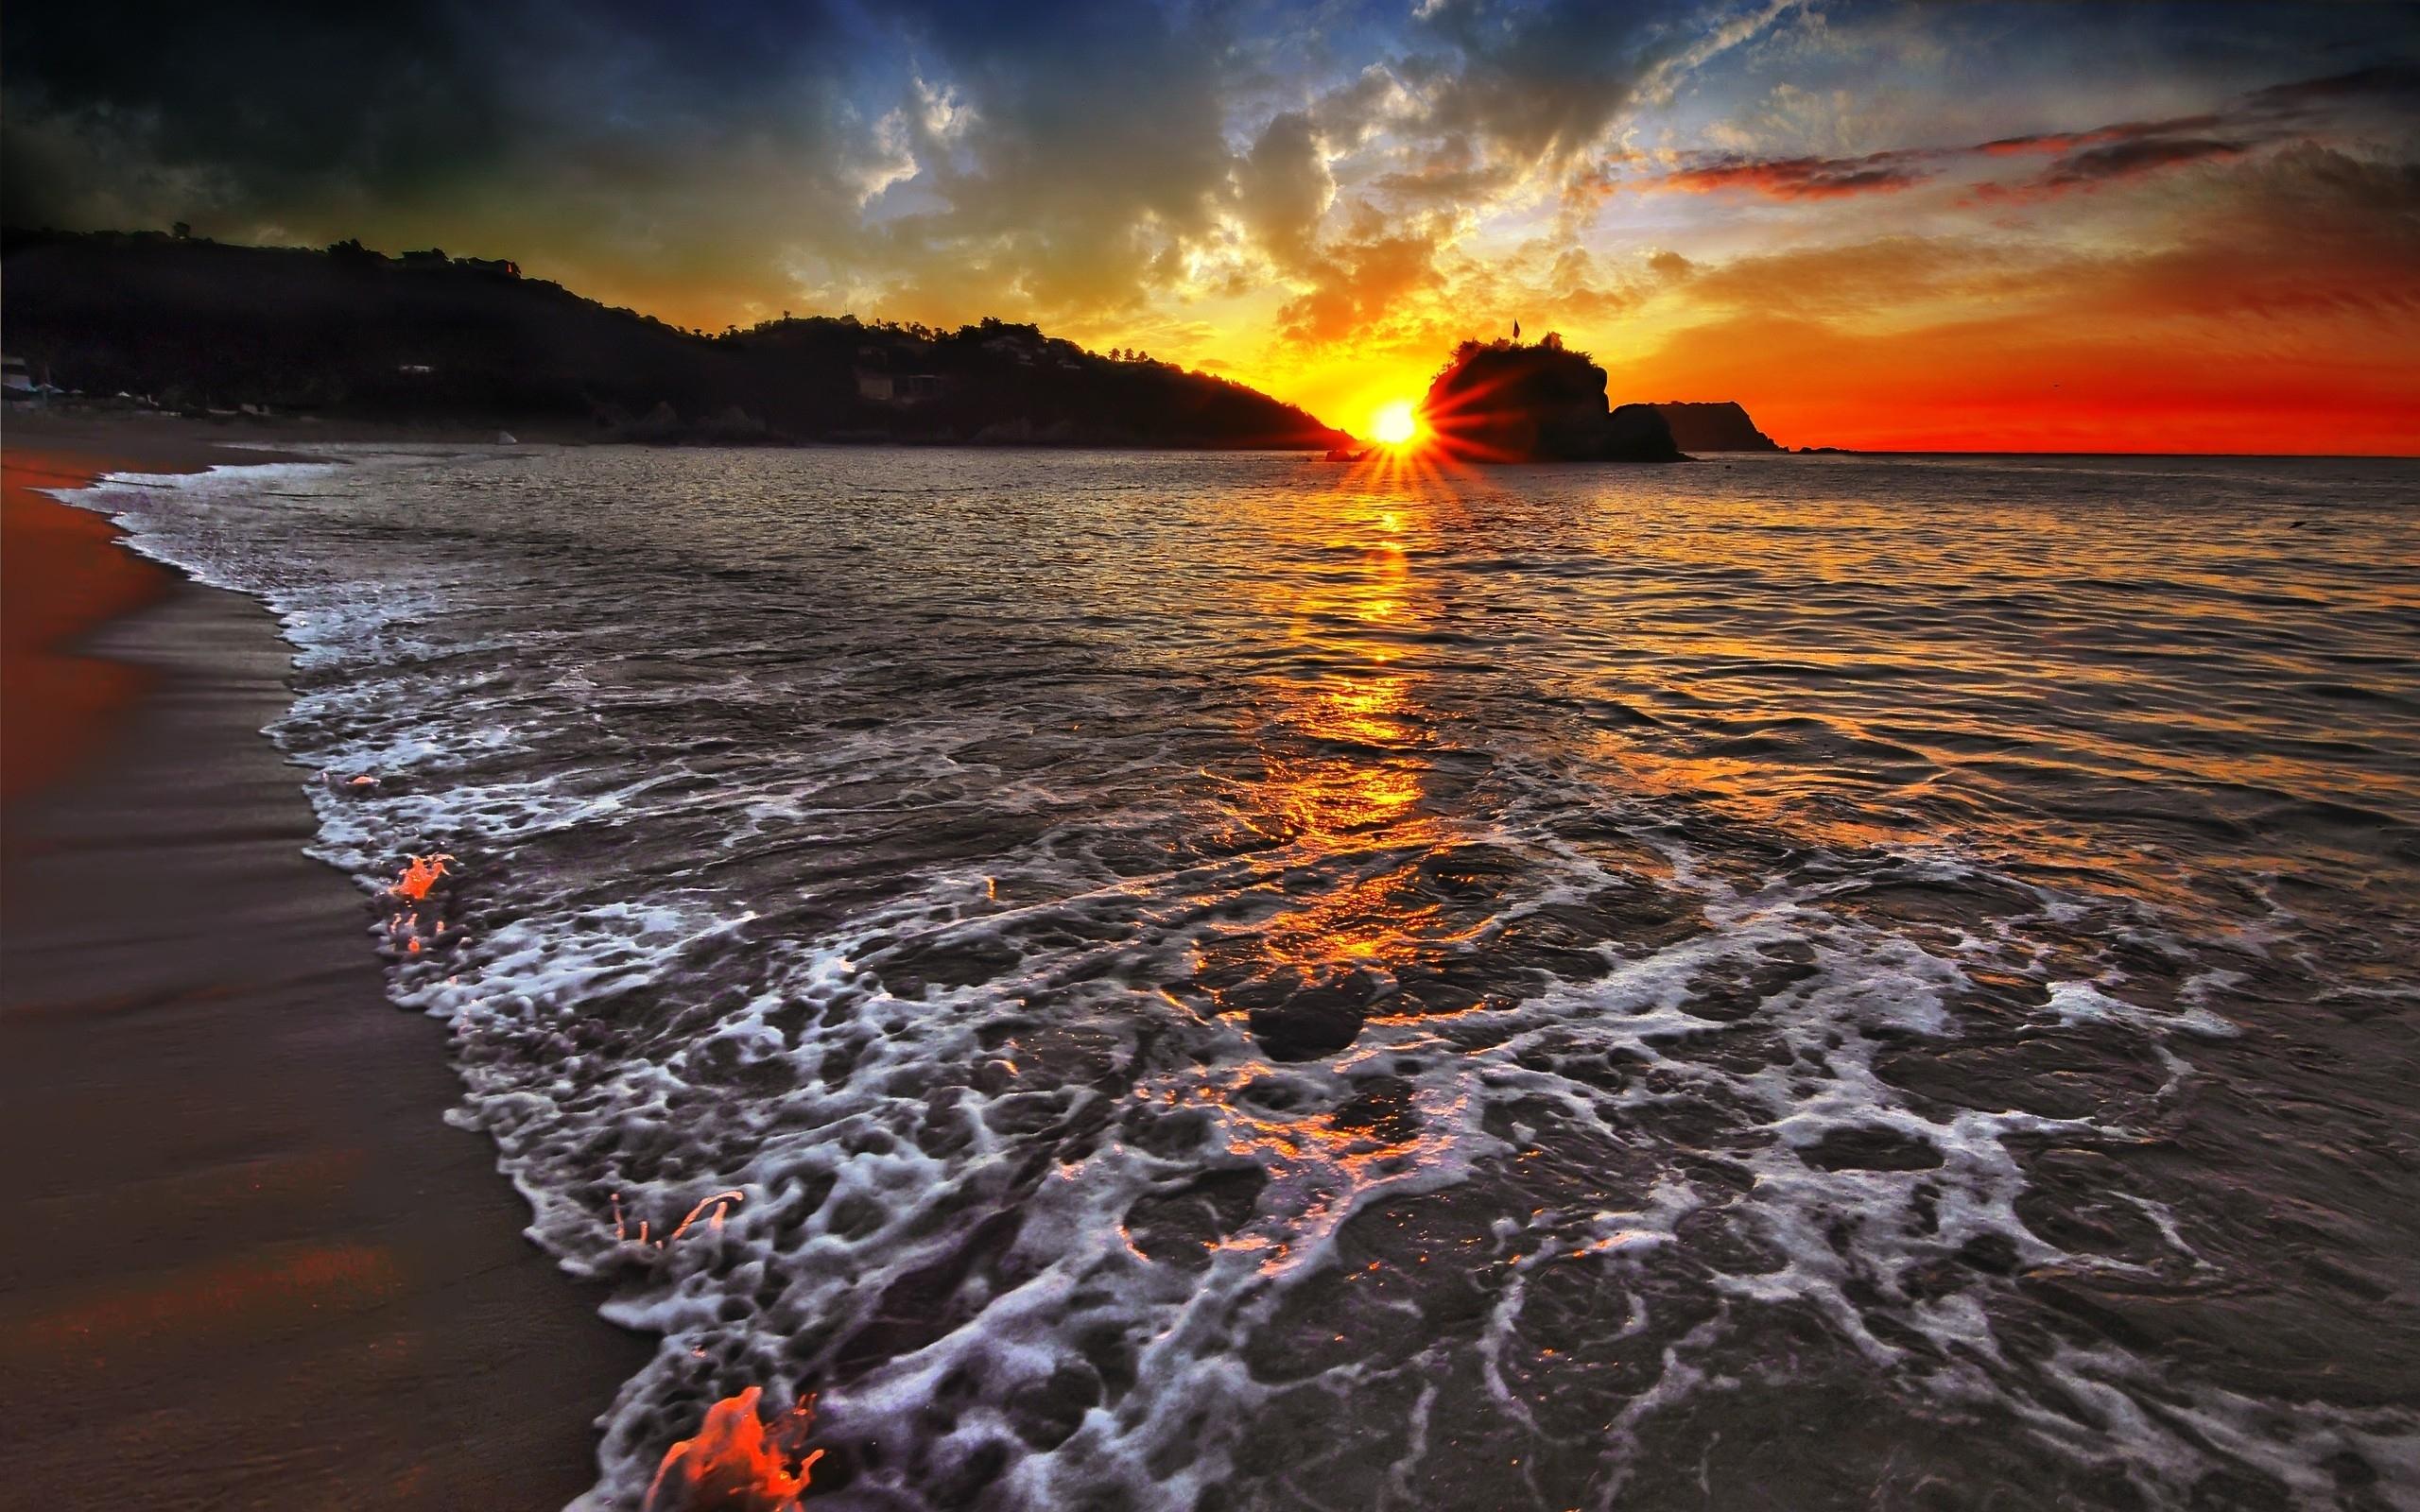 wallpaper sunset landscapes nature beach categories nature landscapes 2560x1600